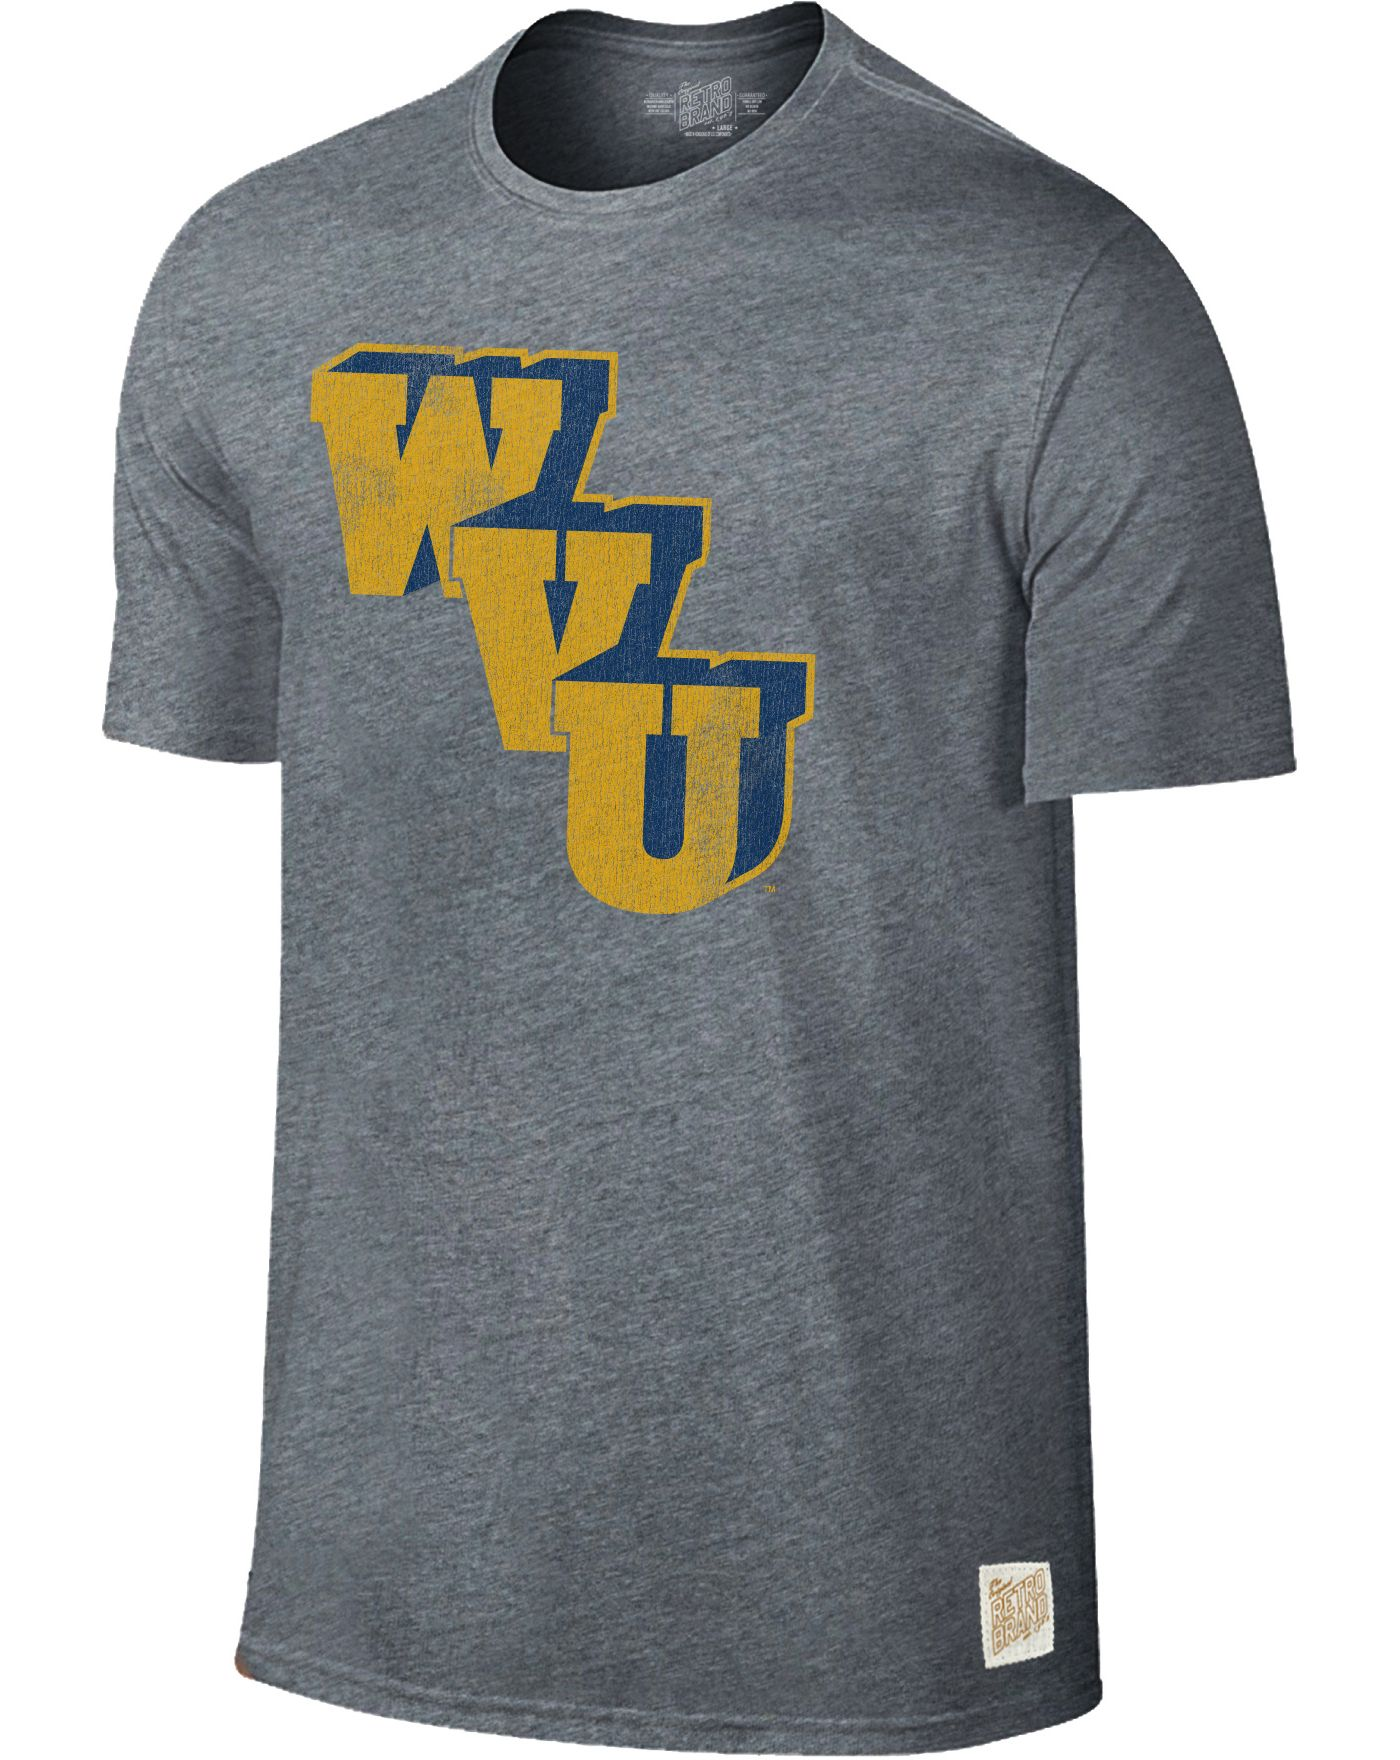 Original Retro Brand Men's West Virginia Mountaineers Grey Retro Tri-Blend T-Shirt